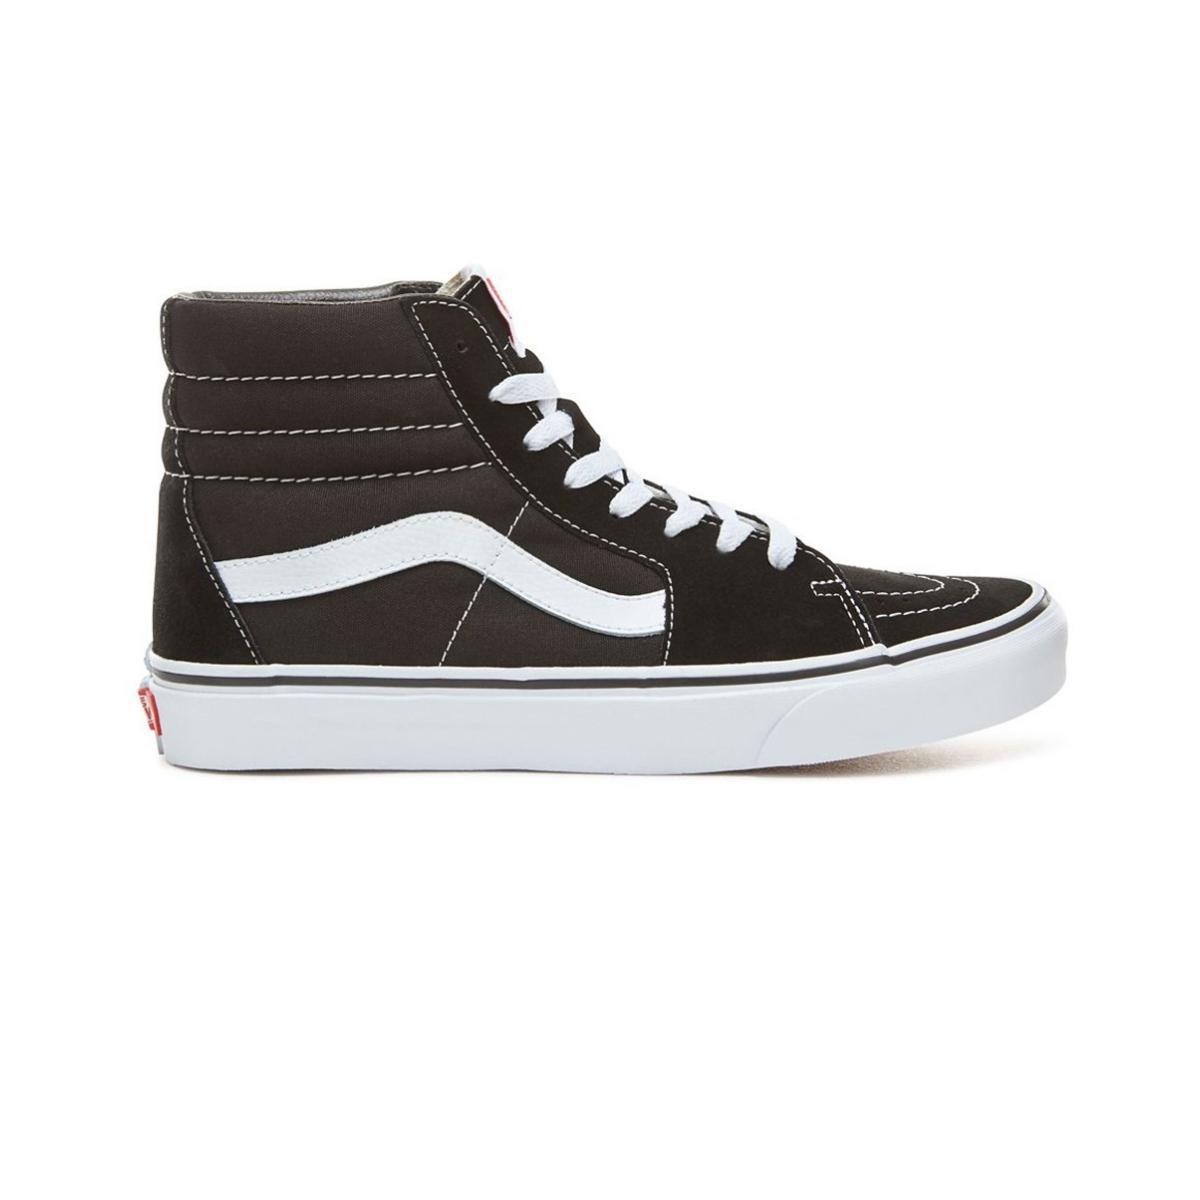 Scarpe Sneakers Vans SK8-HI da donna rif. VN000D5IB8C